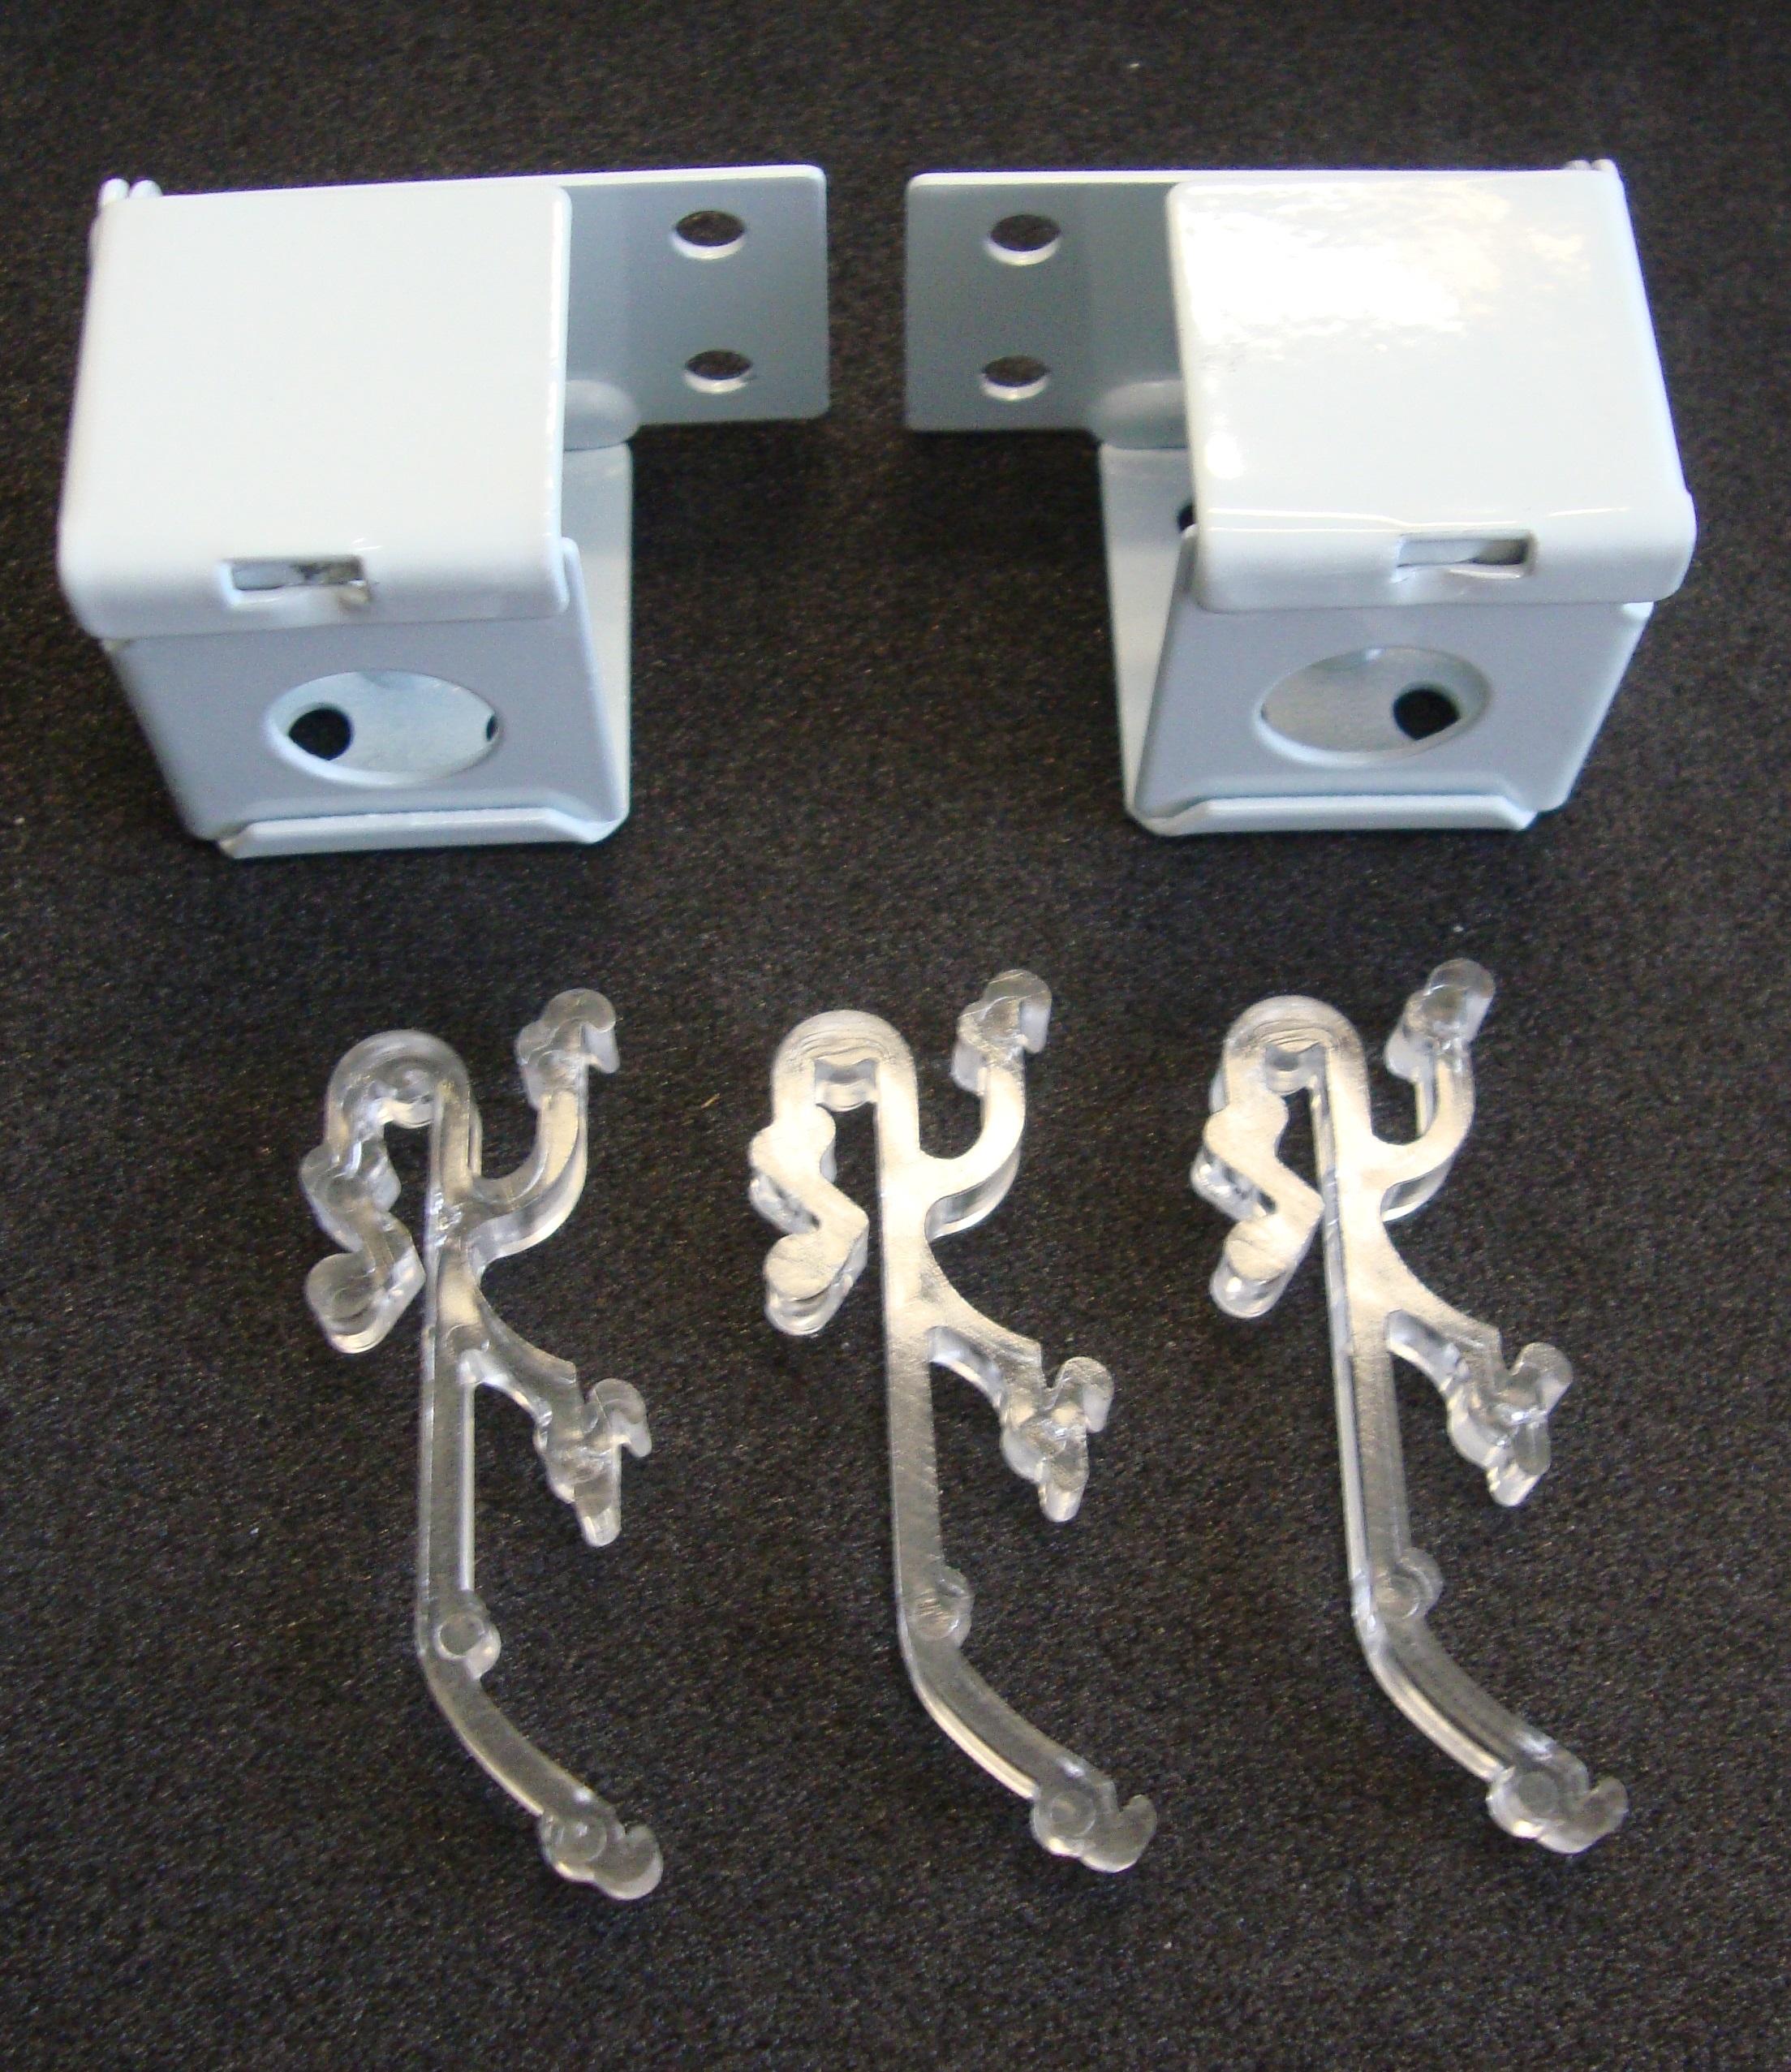 2 Qty 1 Mini Blind Mounting Kits Metal Brackets Double